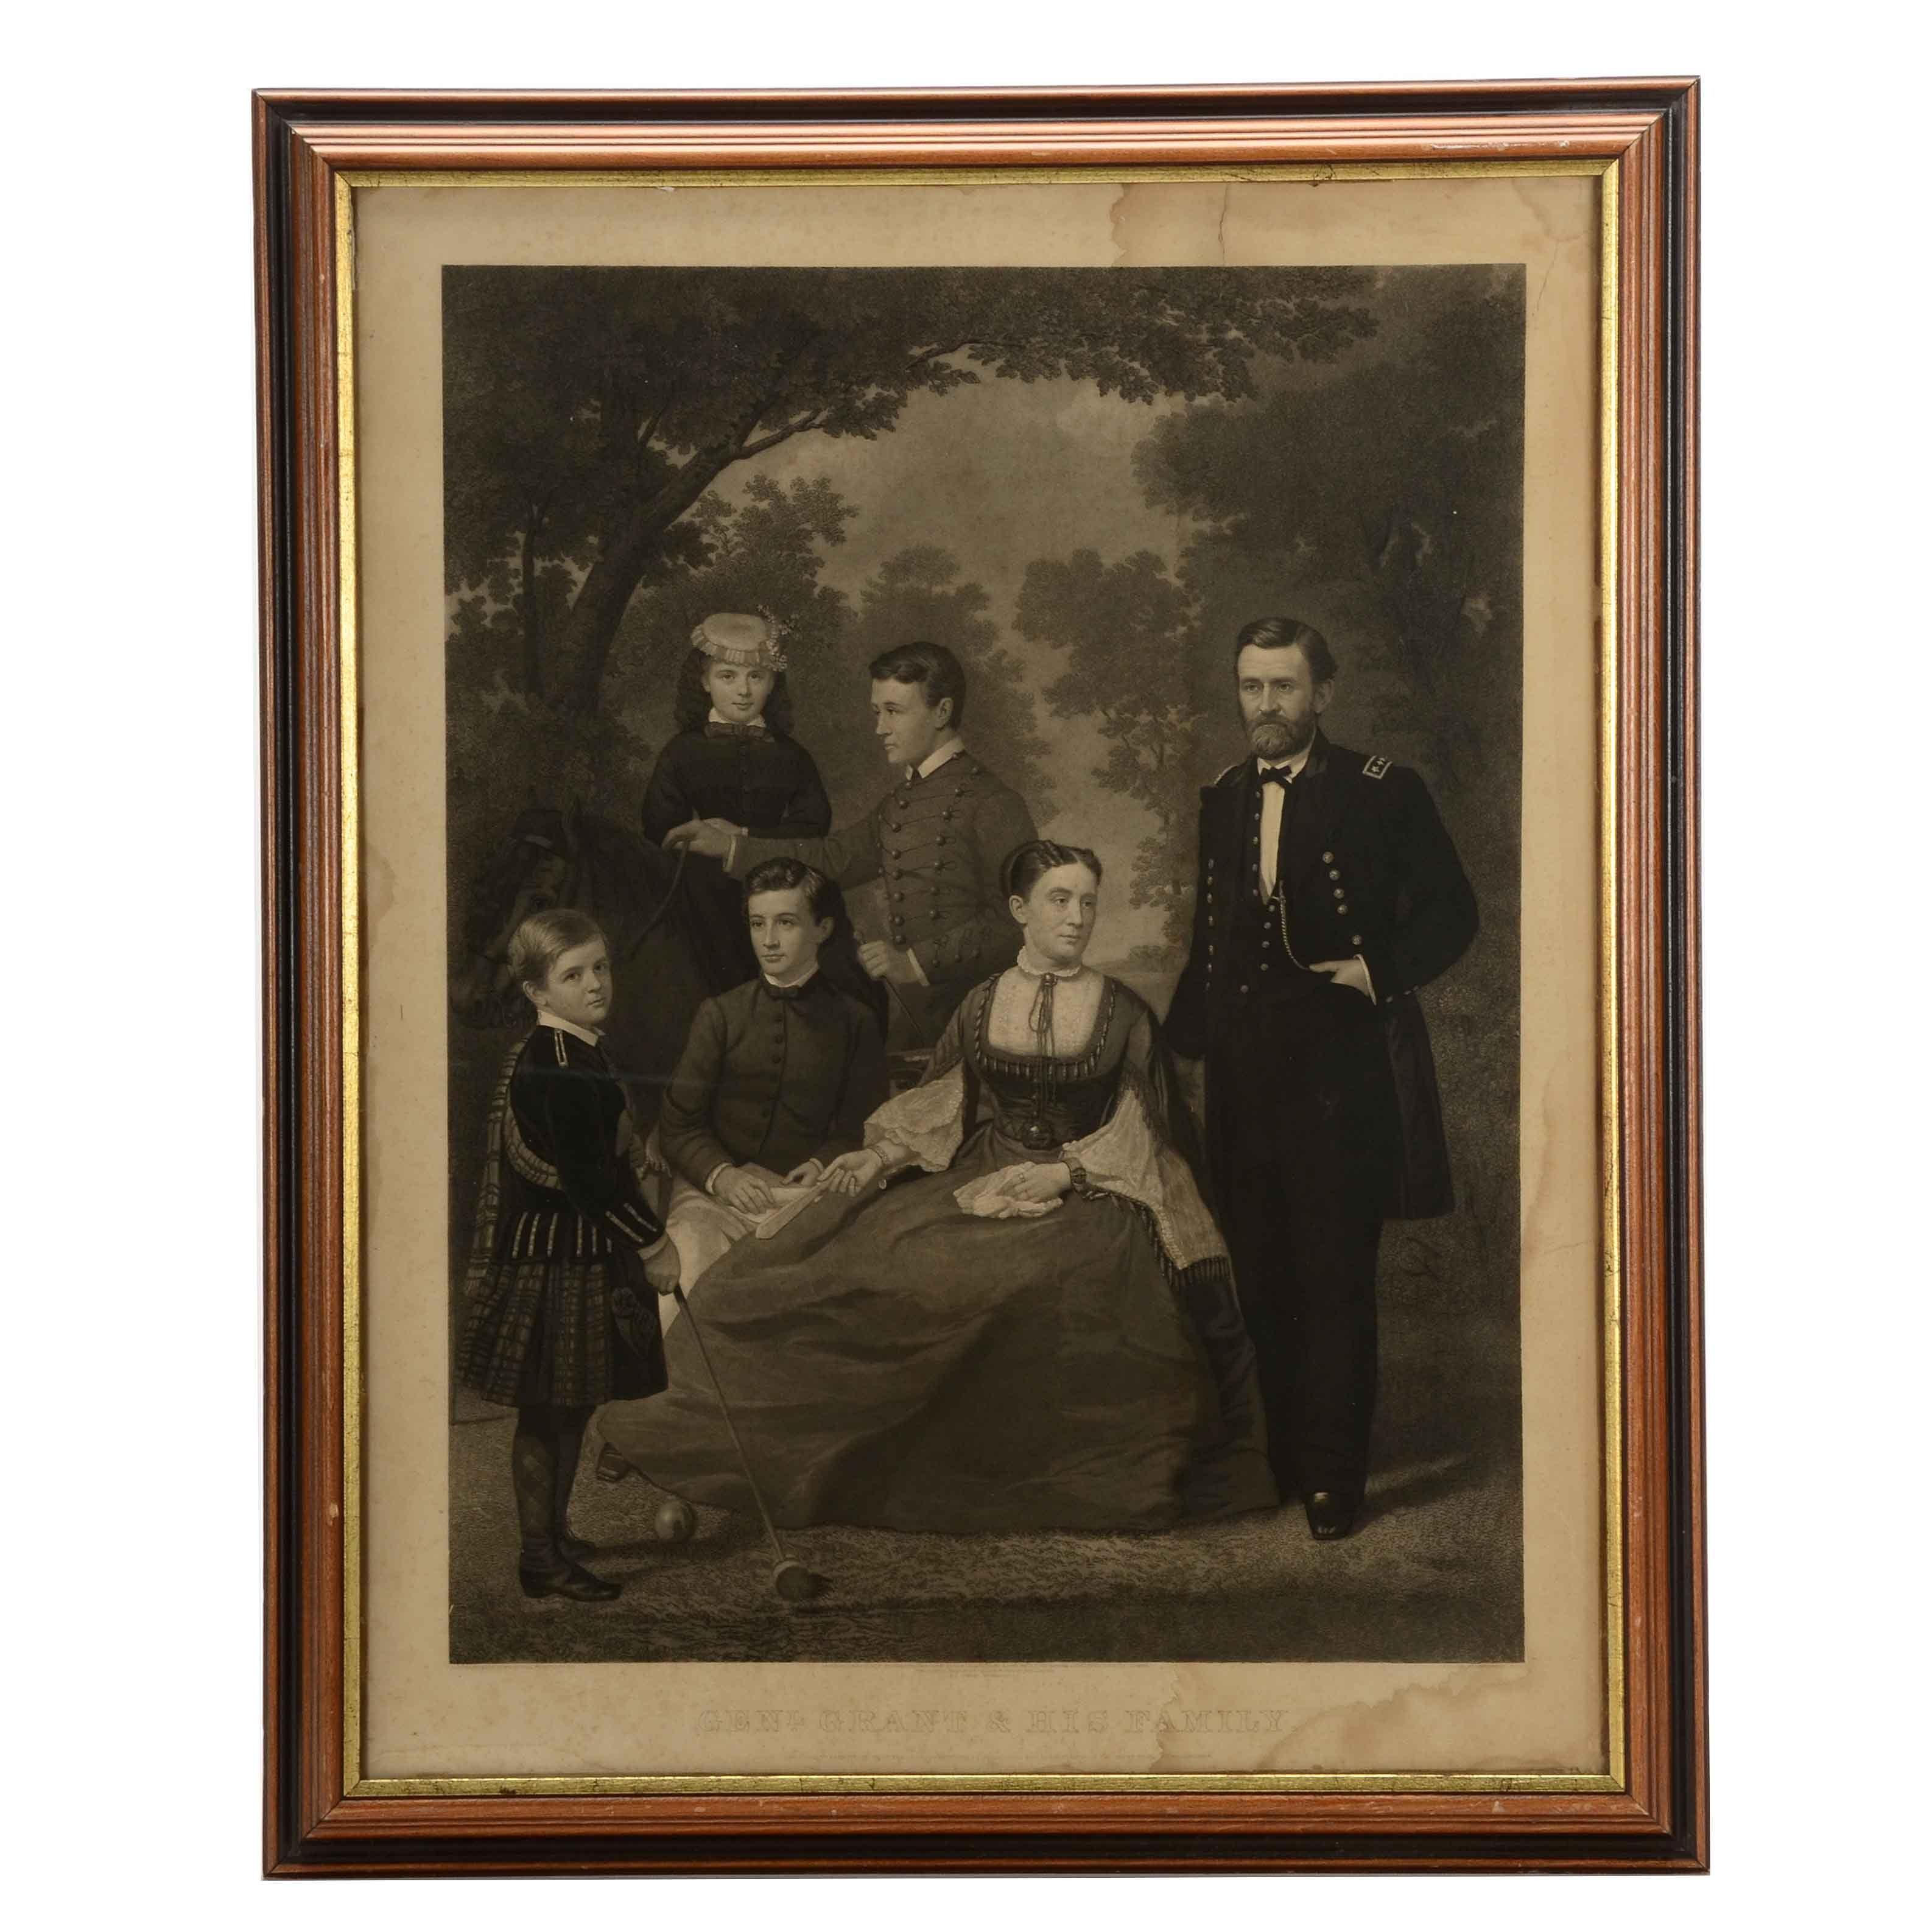 General Grant & His Family Engraving Print